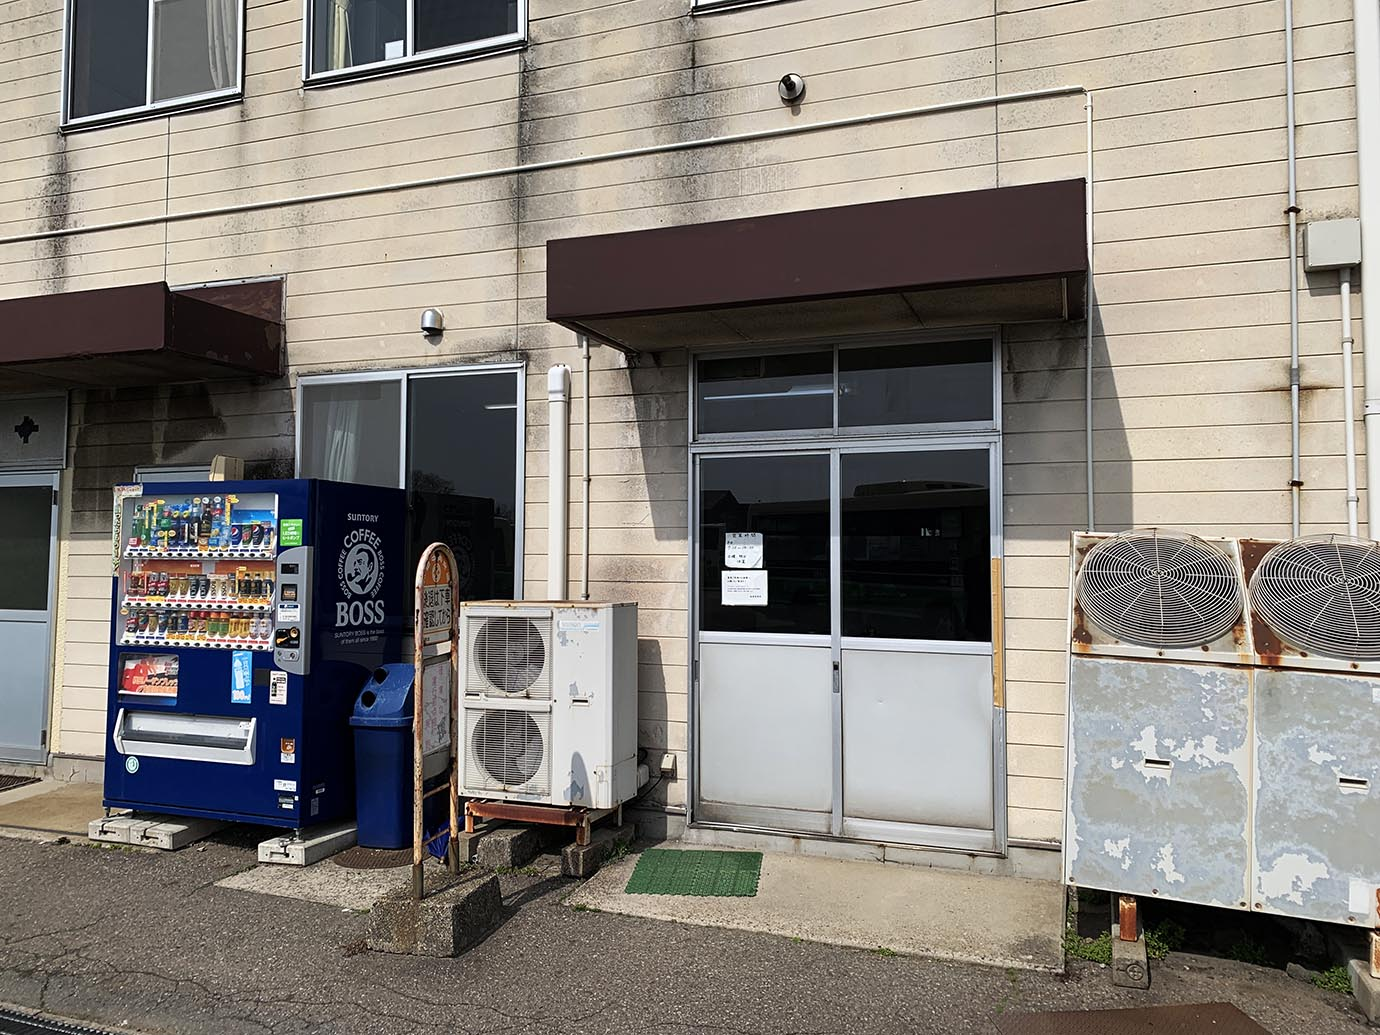 akita-bus-driver-cafeteria15